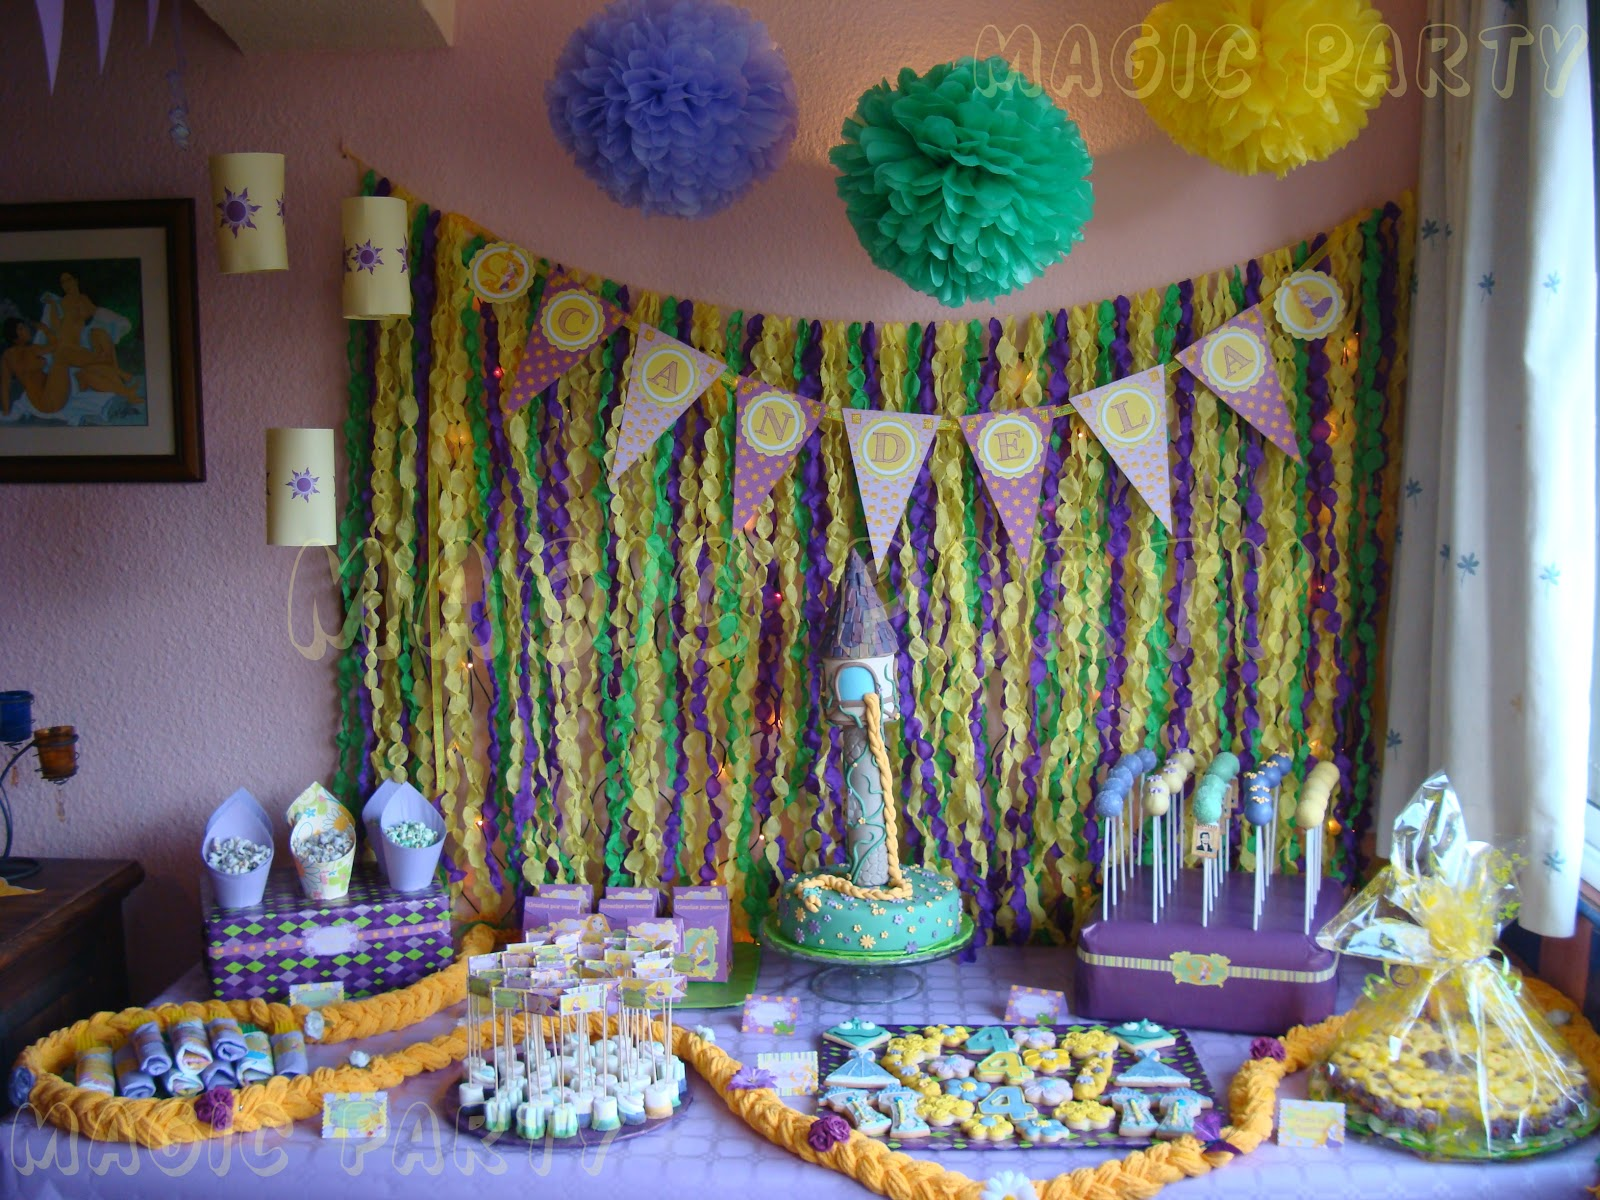 Decoracion rapunzel para fiestas for Decoracion para pared fiesta